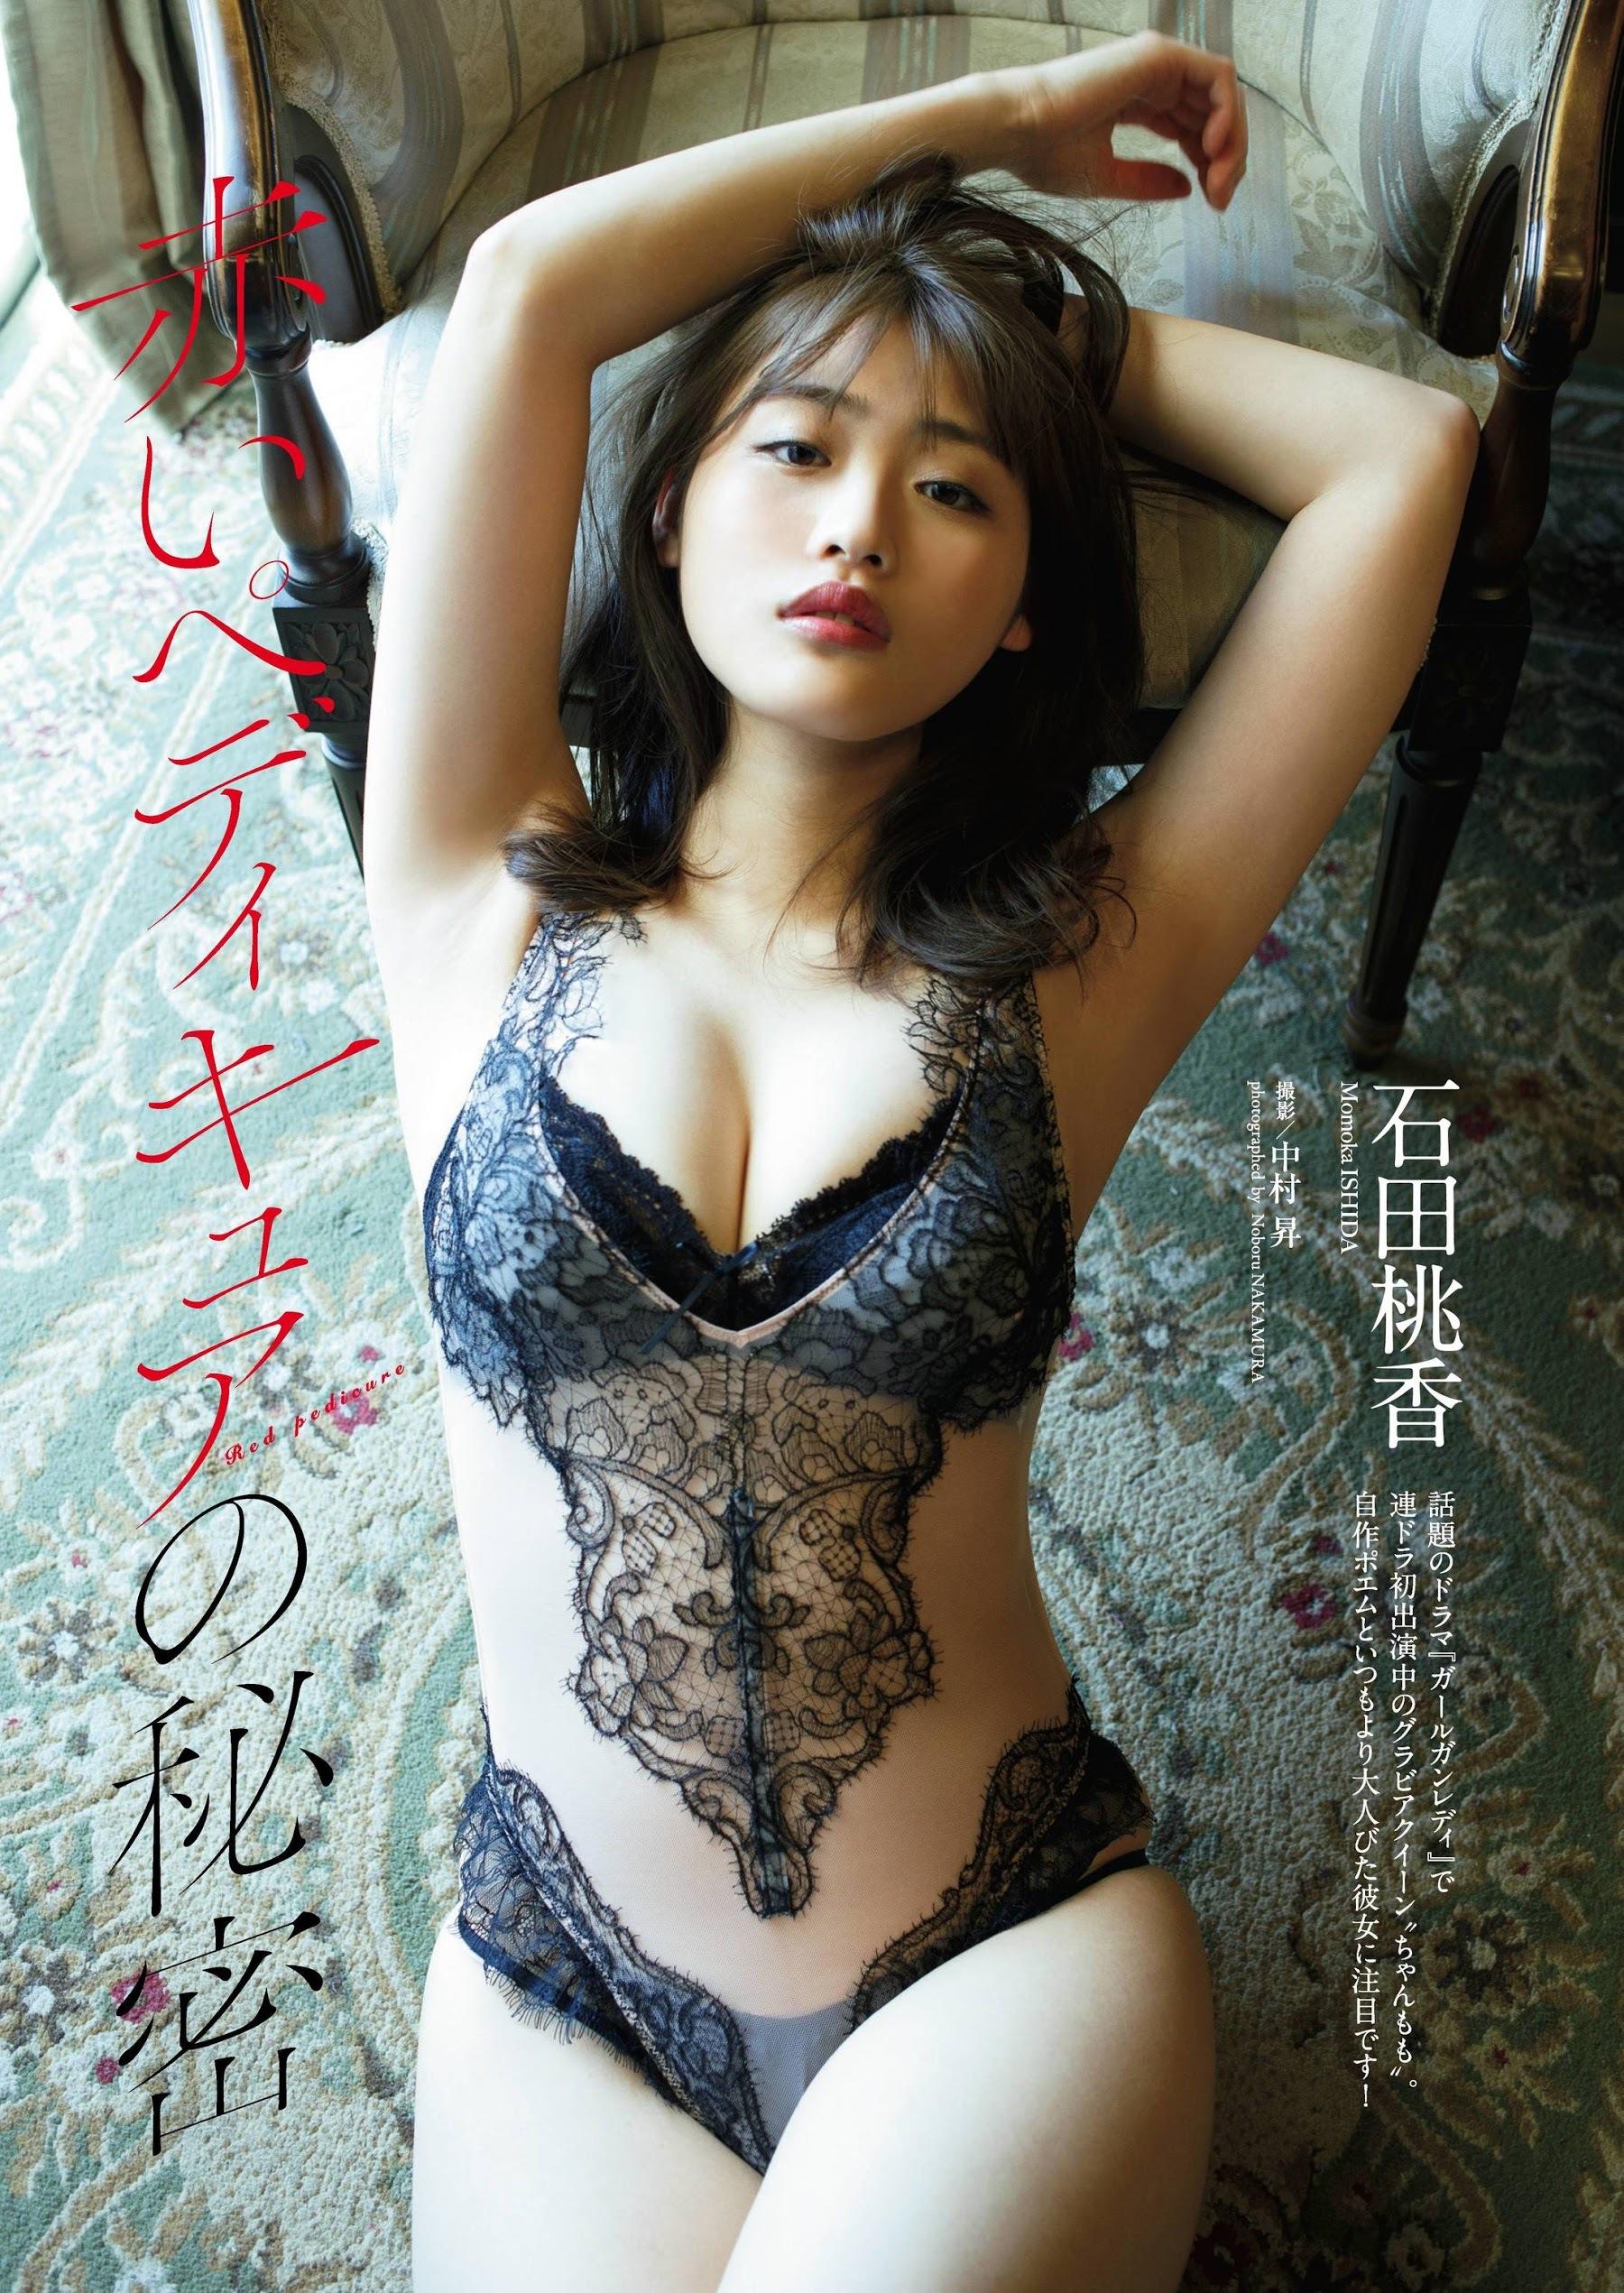 小山璃奈 頓知気さきな 伊藤美来-Weekly Playboy 2021年第十八期 高清套图 第31张